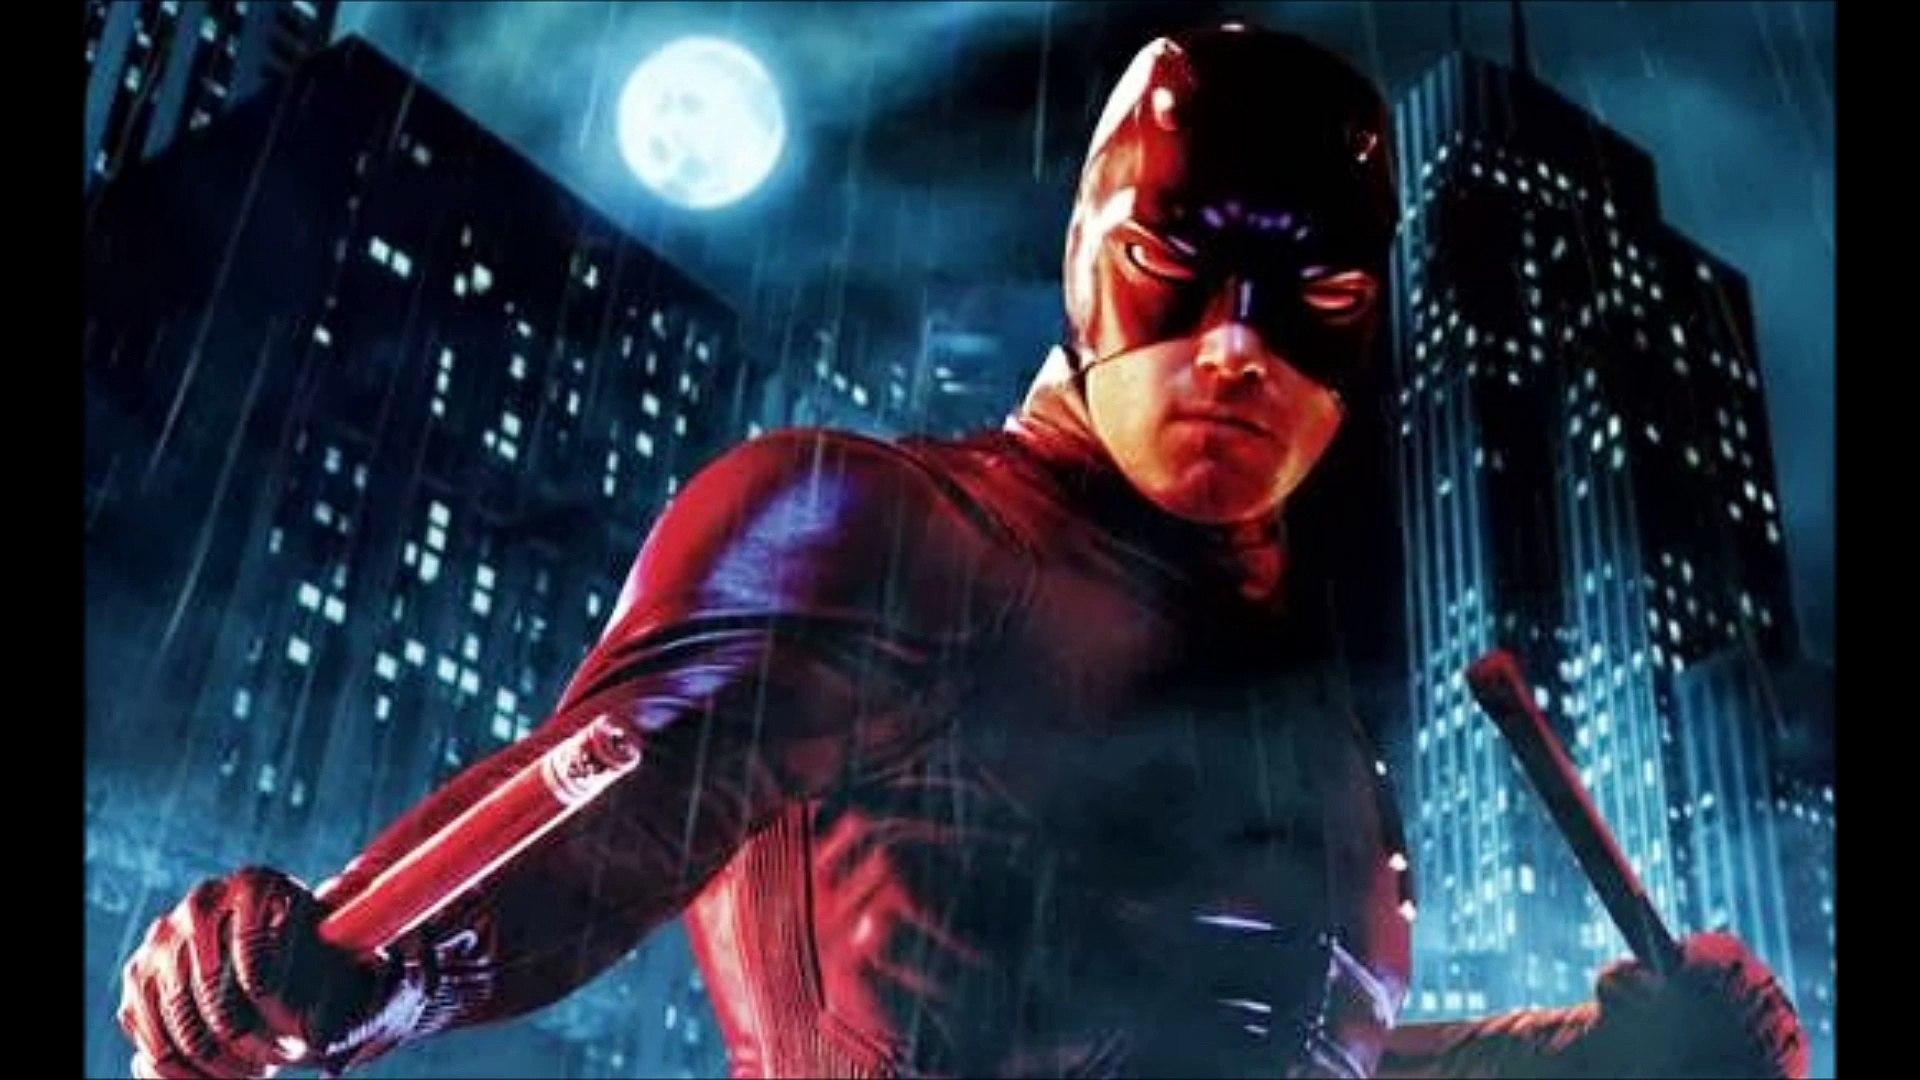 Daredevil 2003 Full Movie Online Video Dailymotion